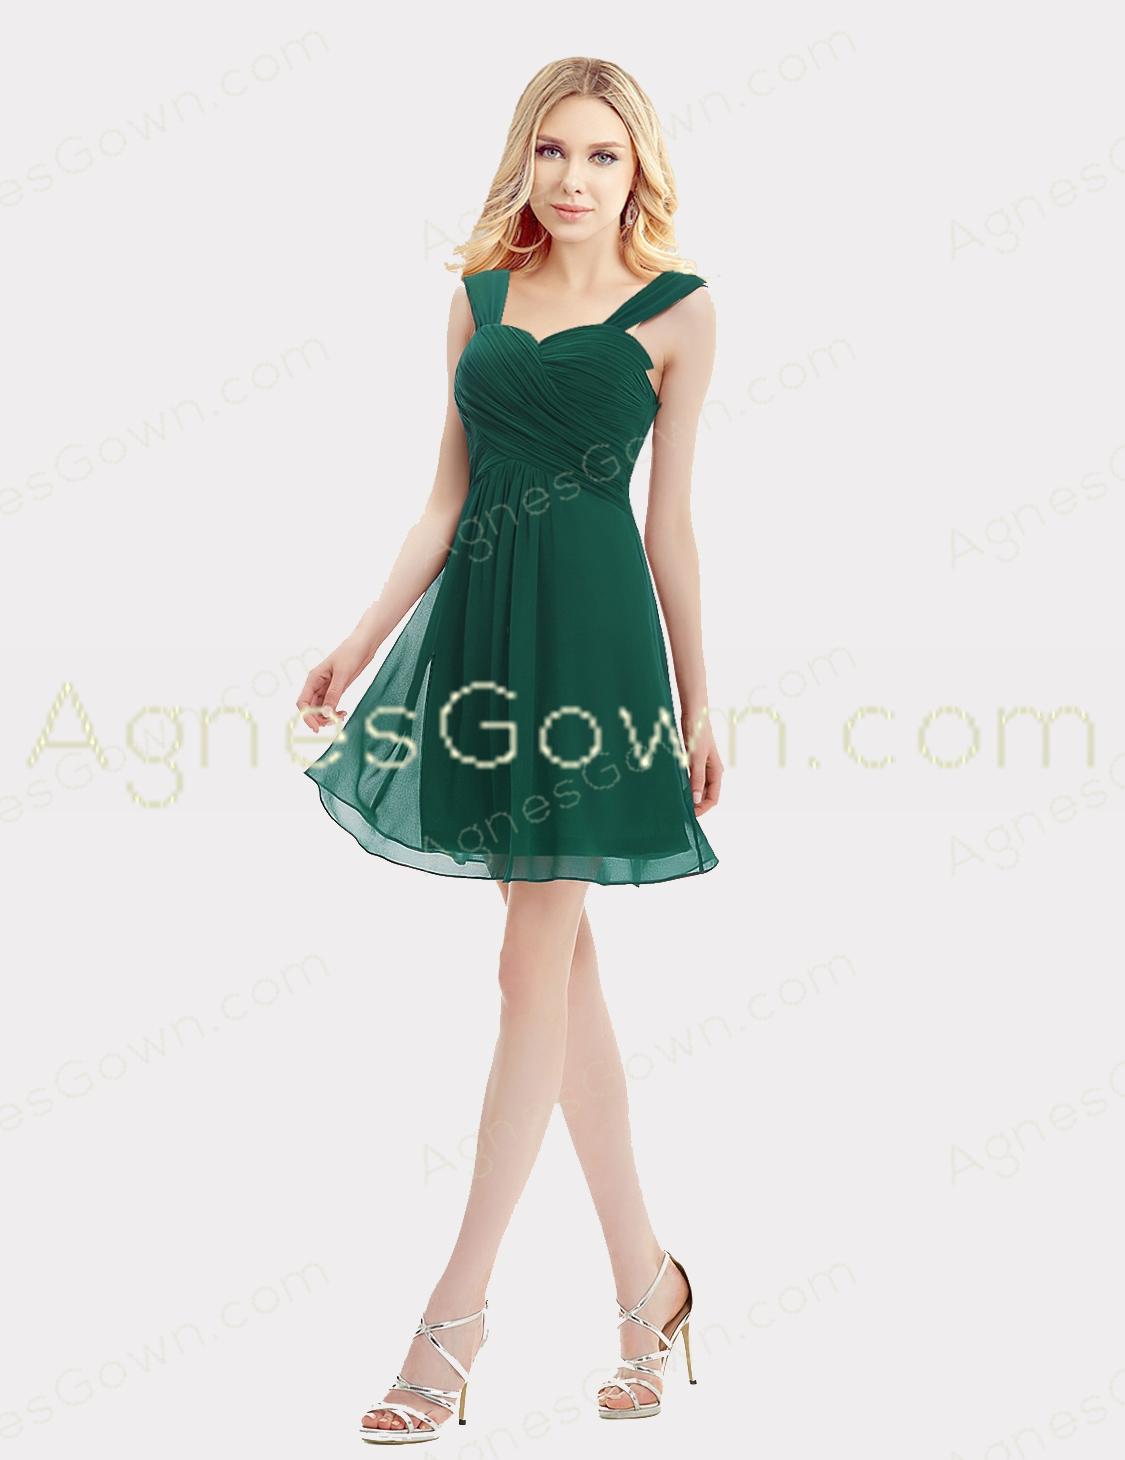 Hunter Green Short Graduation Dress